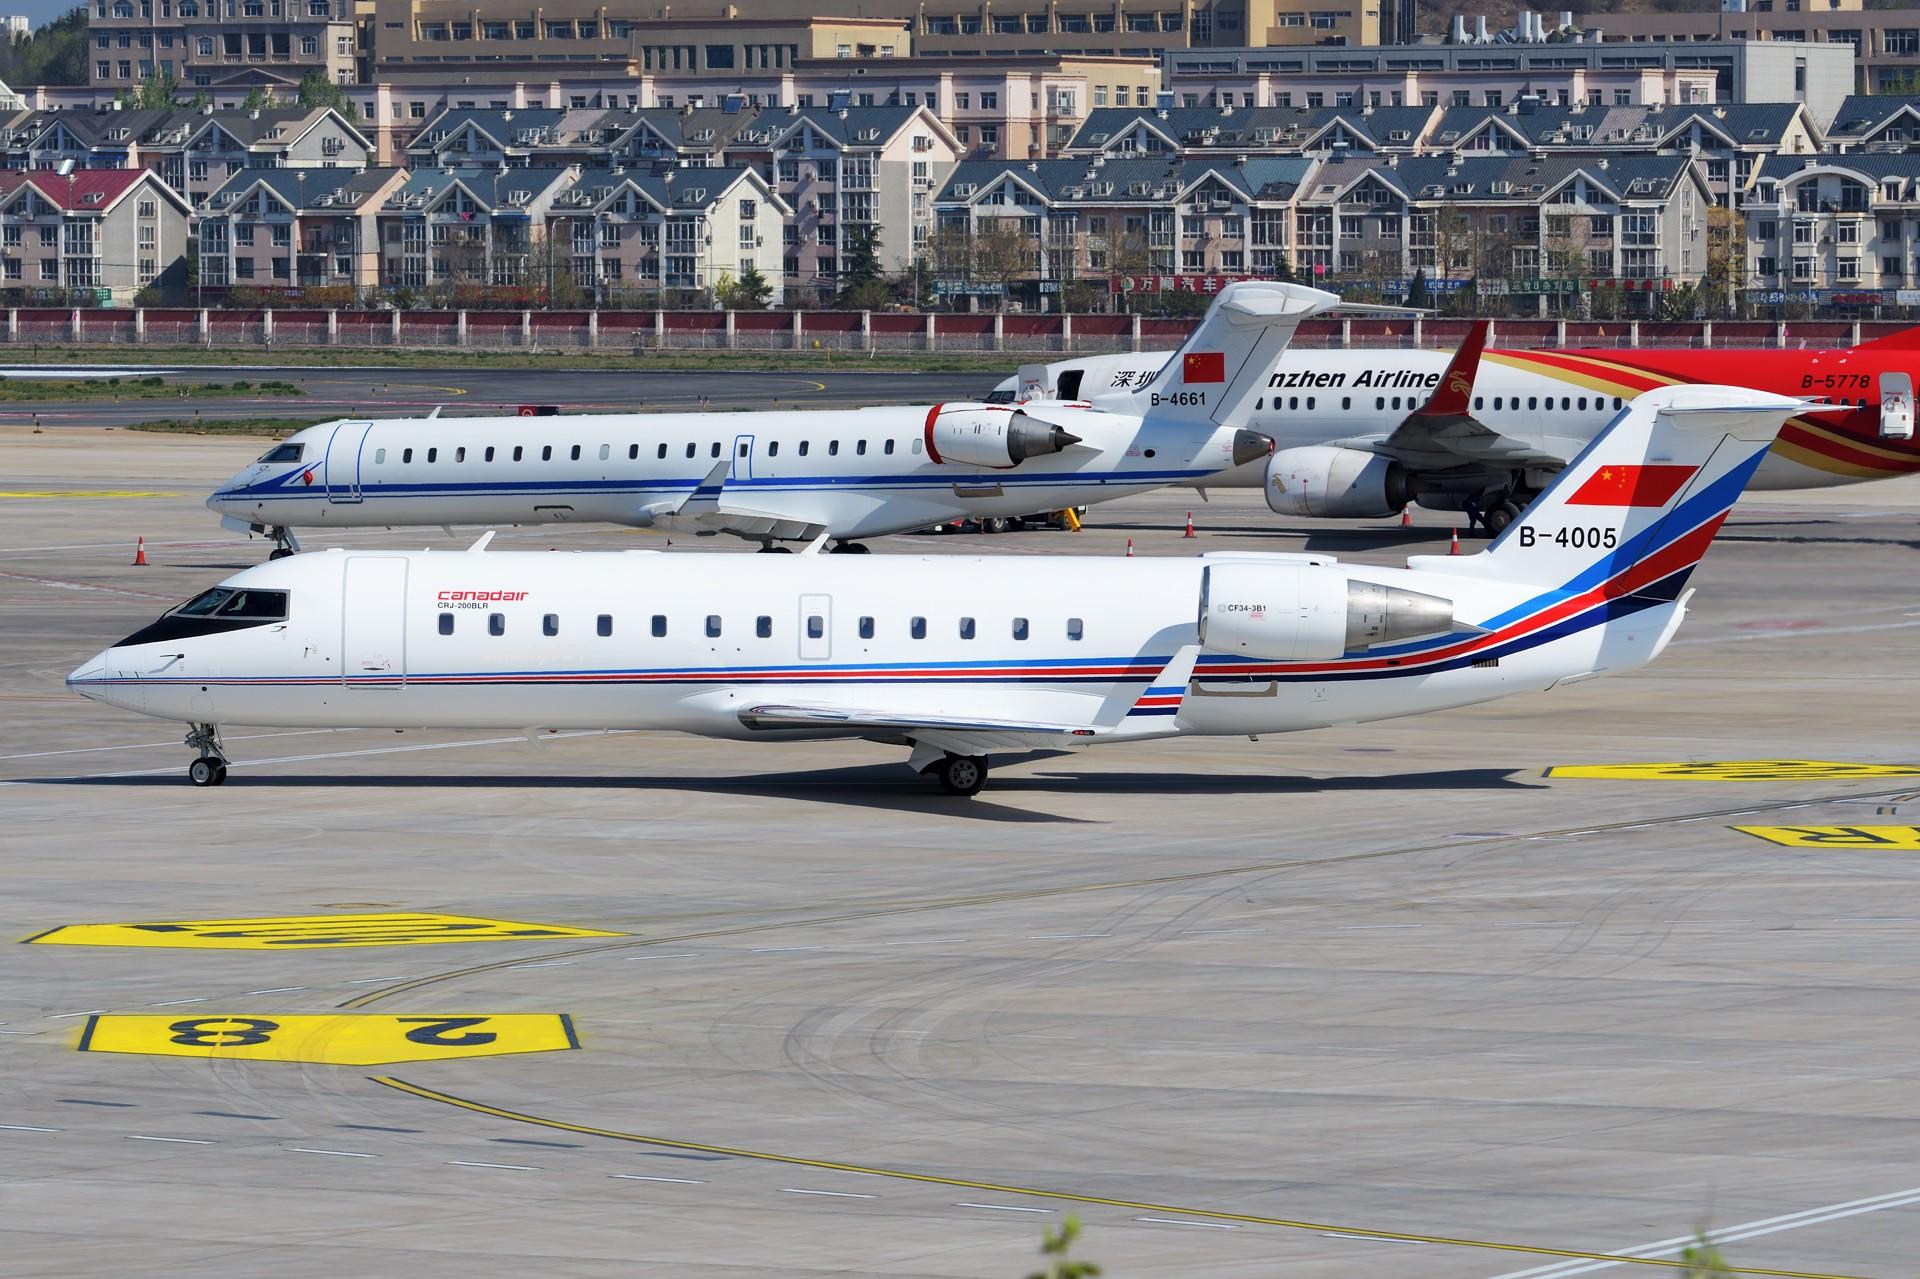 Re:[原创]★[DLC]一点有趣的事情(持续更新中)★ BOMBARDIER CRJ-200 B-4005 中国大连国际机场